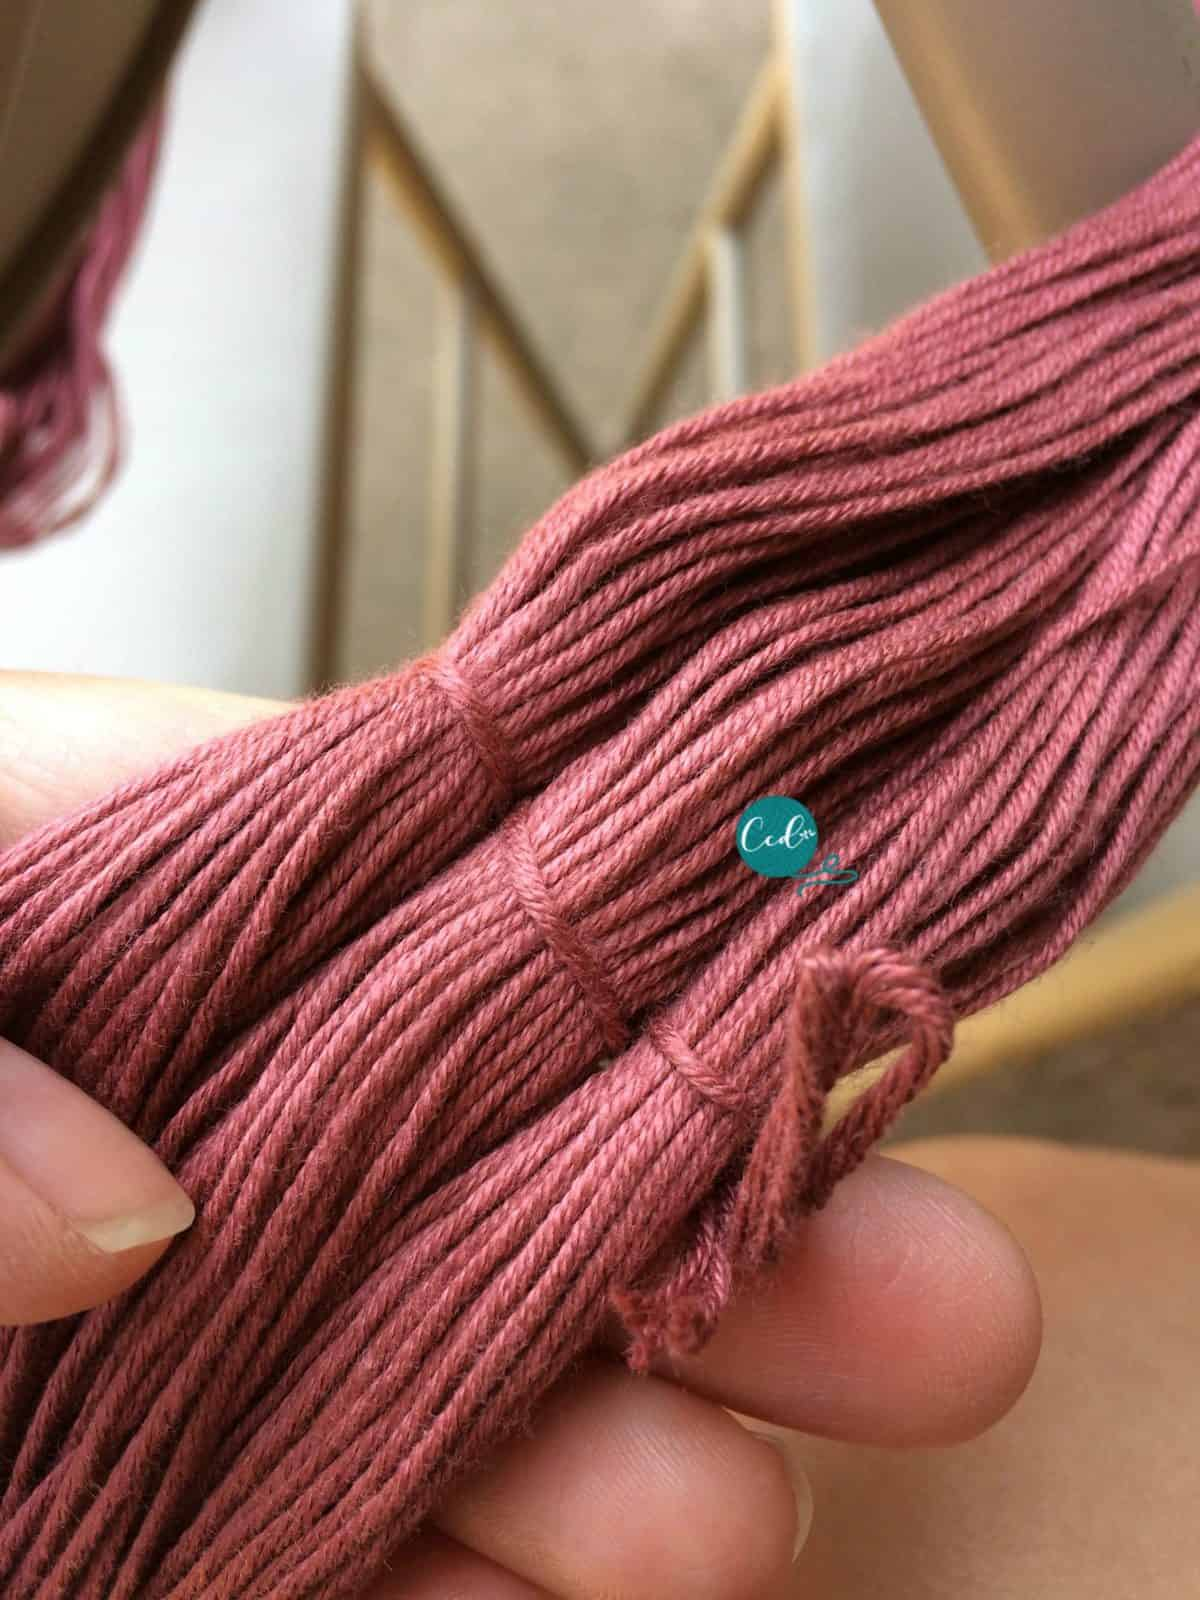 Hank of yarn tied.